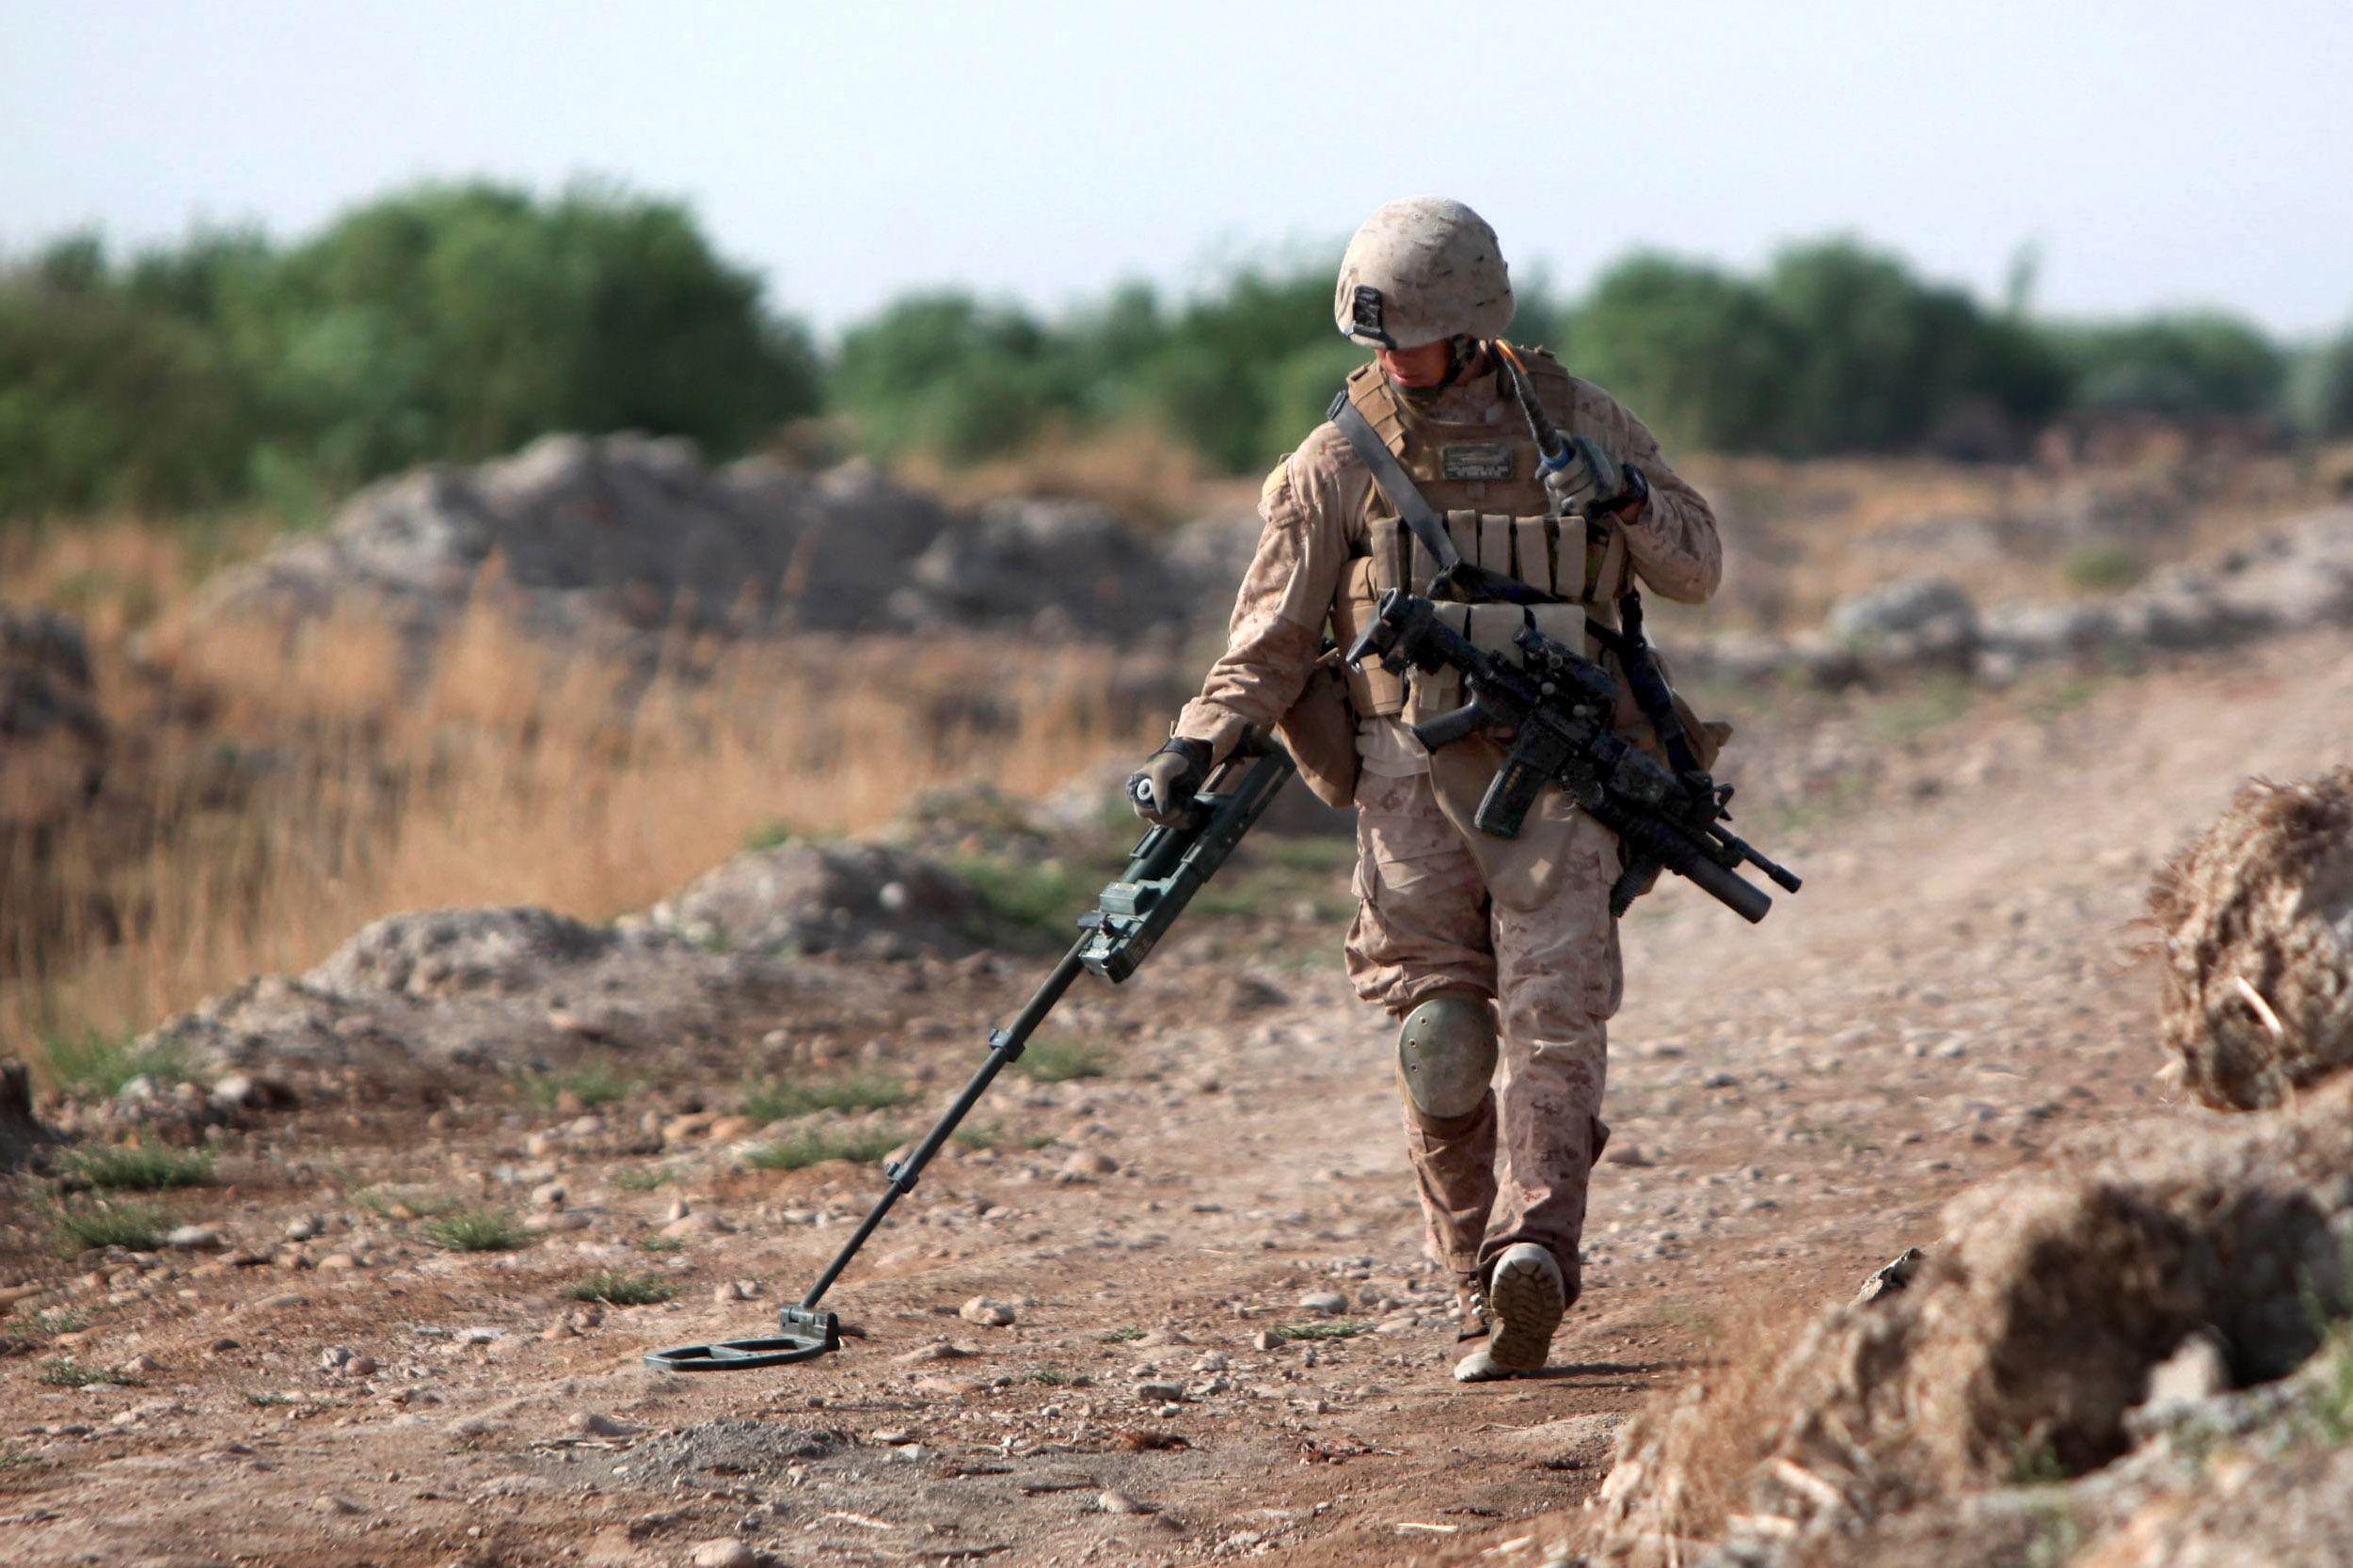 Marine Corps Engineer sweeping | Campo minado | Pinterest | Marine ...